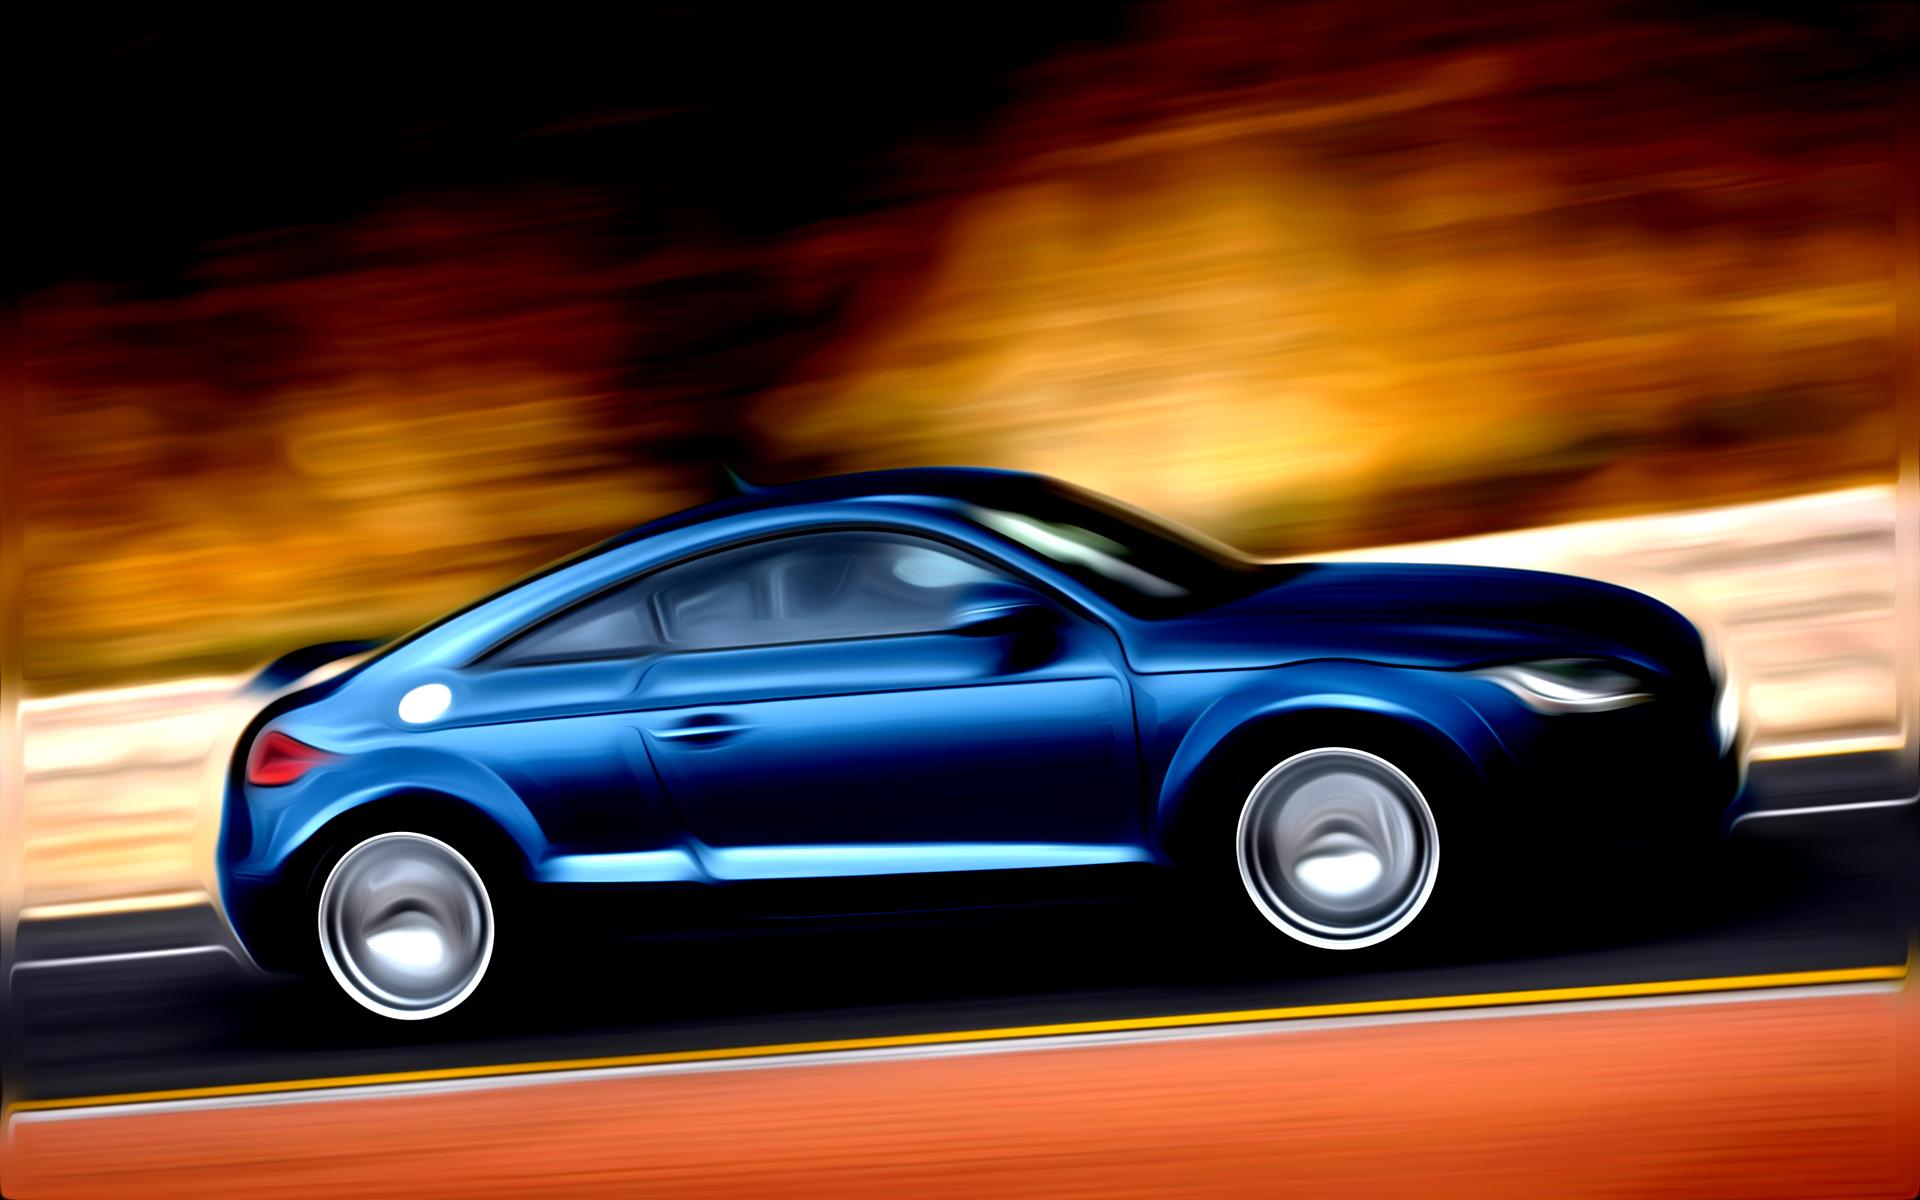 Audi TT Painted